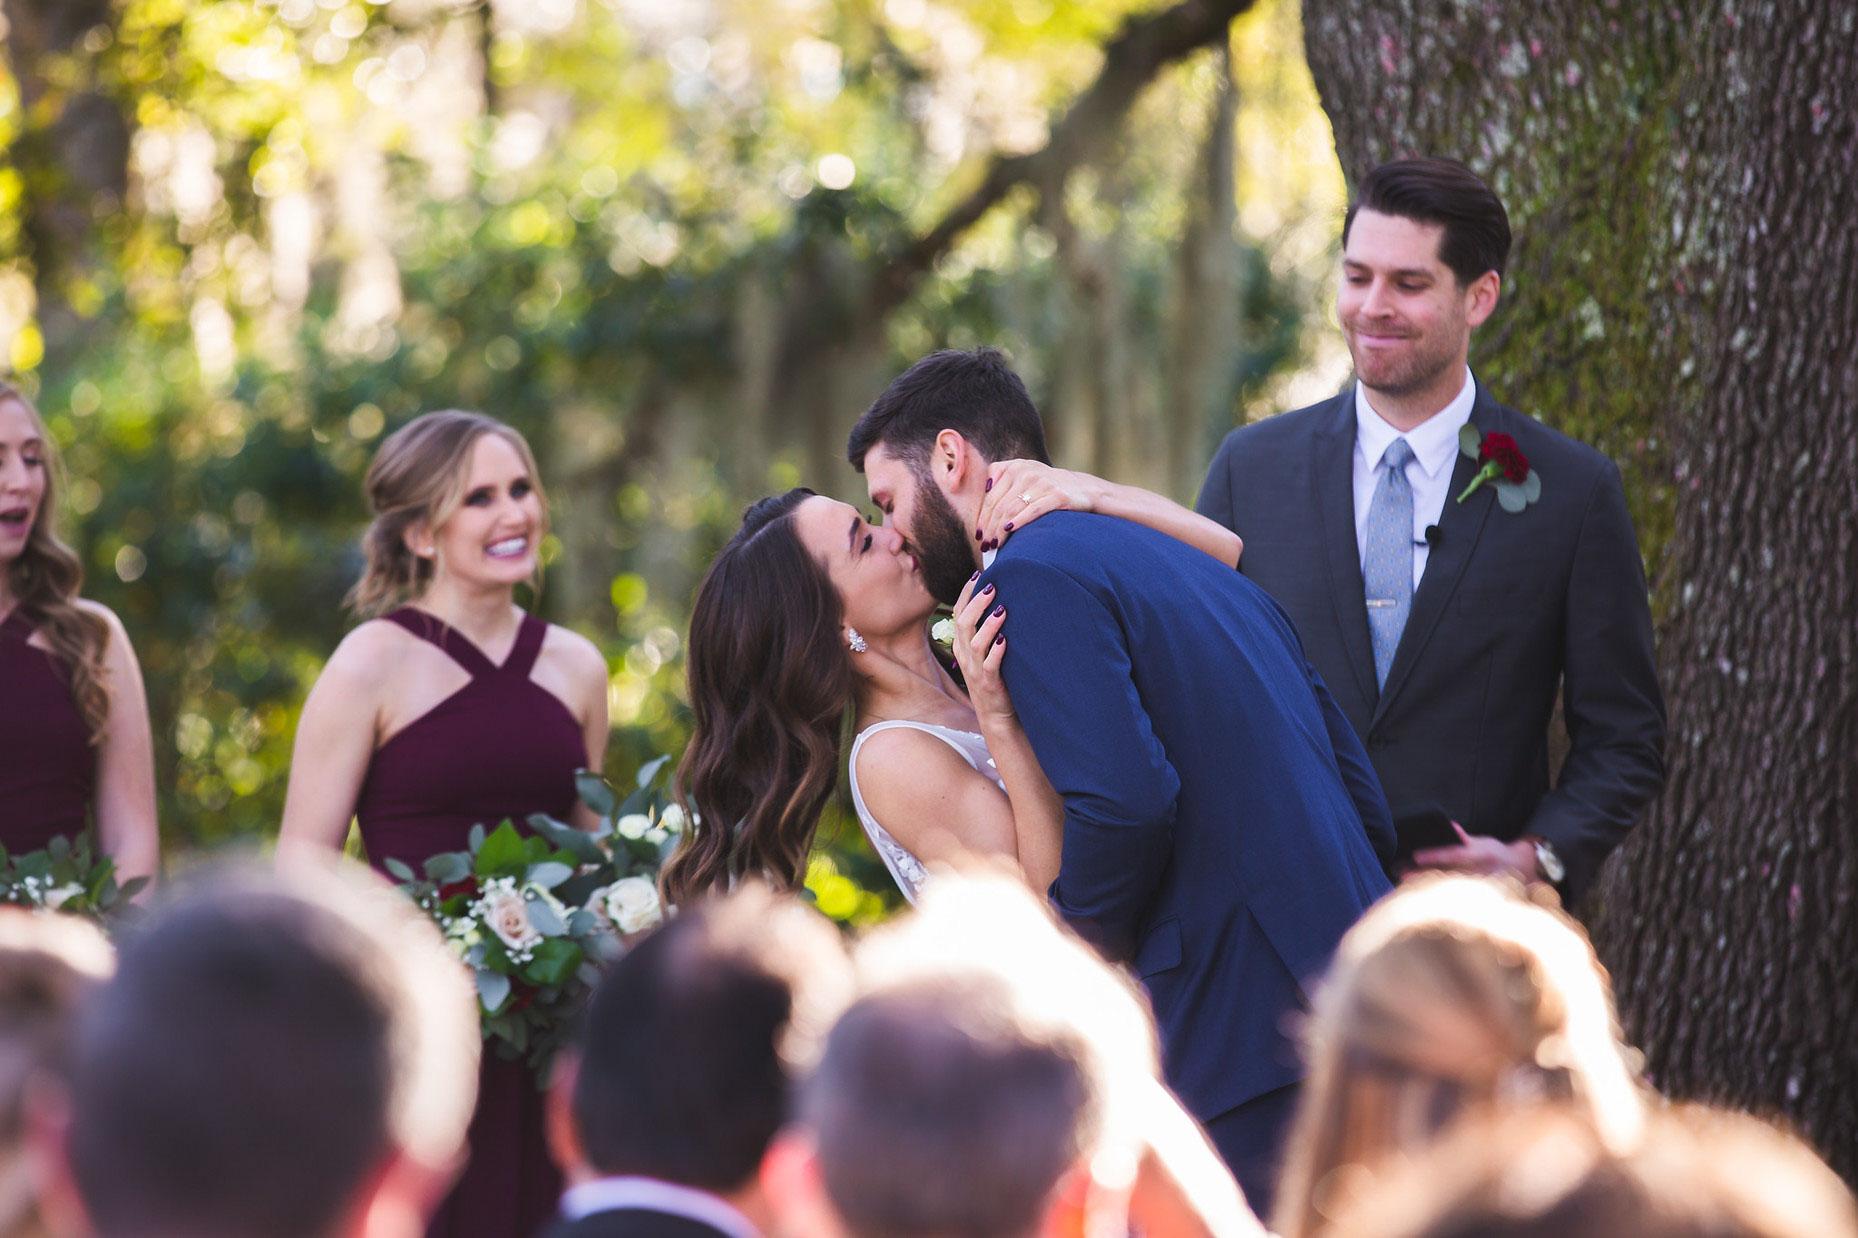 adam-szarmack-bowing-oaks-wedding-photographer-jacksonville-84.jpg